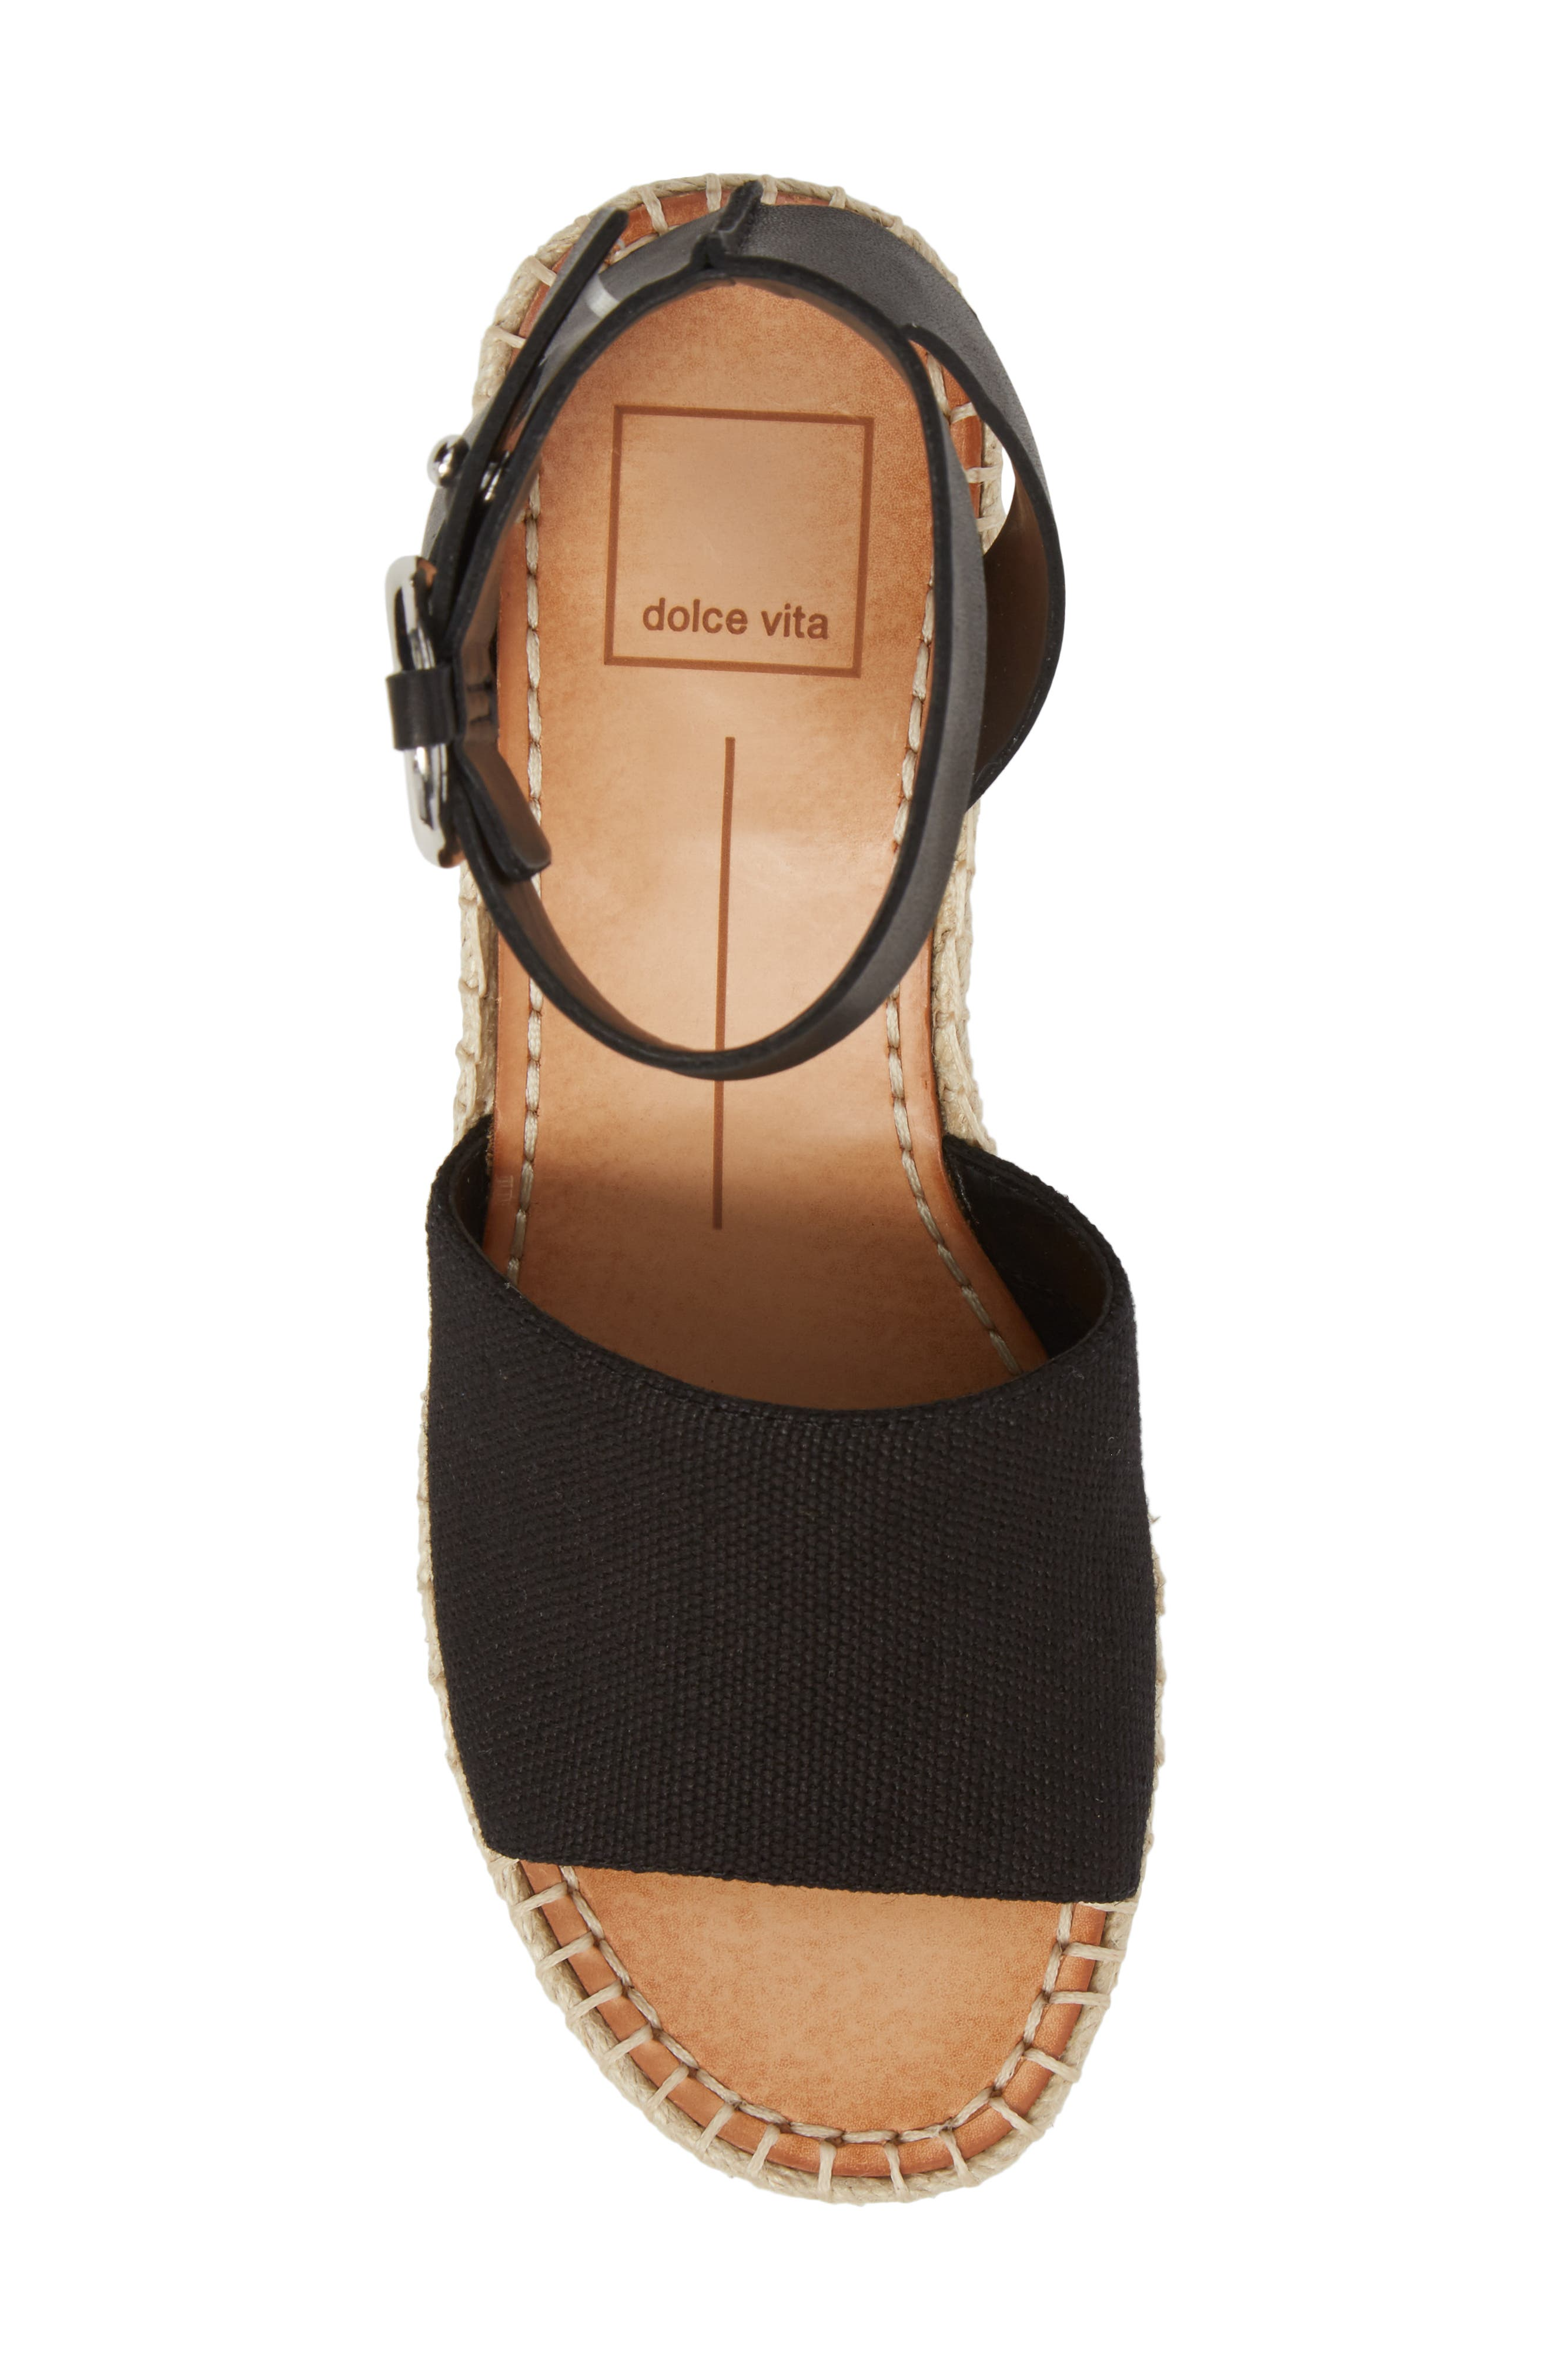 Lesly Espadrille Platform Sandal,                             Alternate thumbnail 5, color,                             001